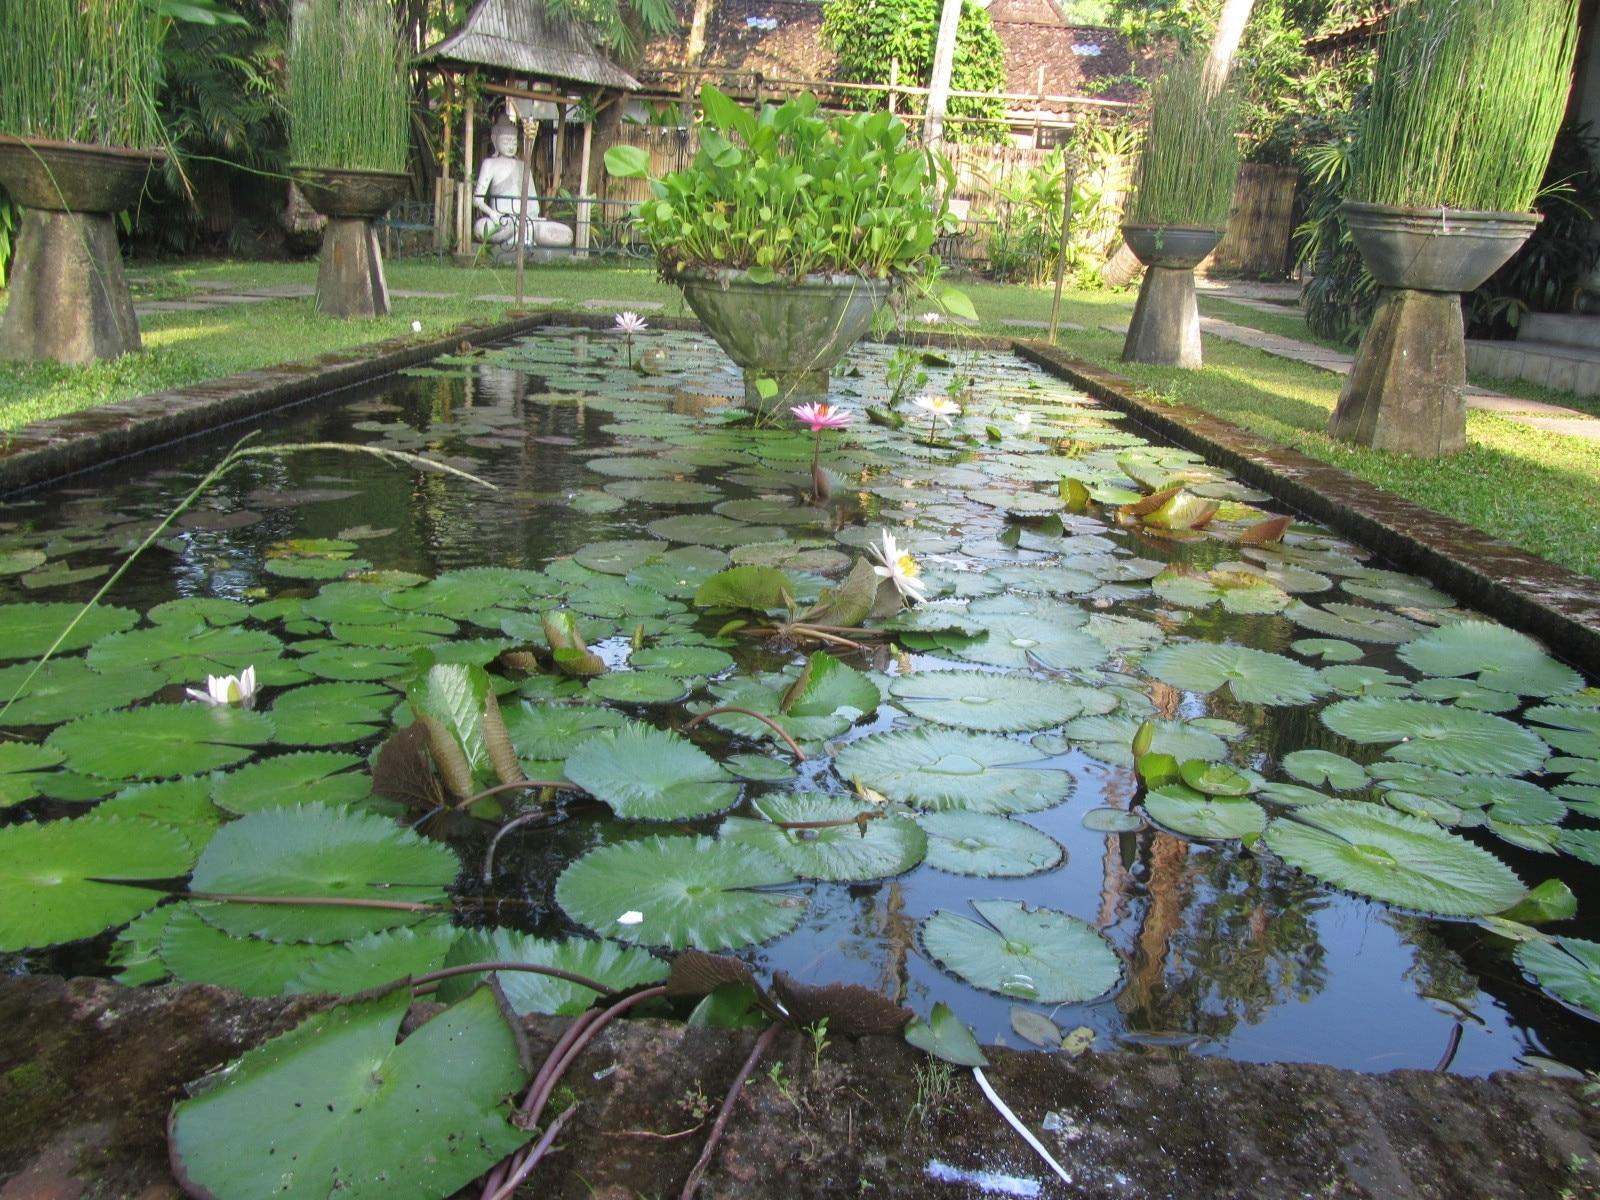 Sewon, Special Region of Yogyakarta, Indonesia